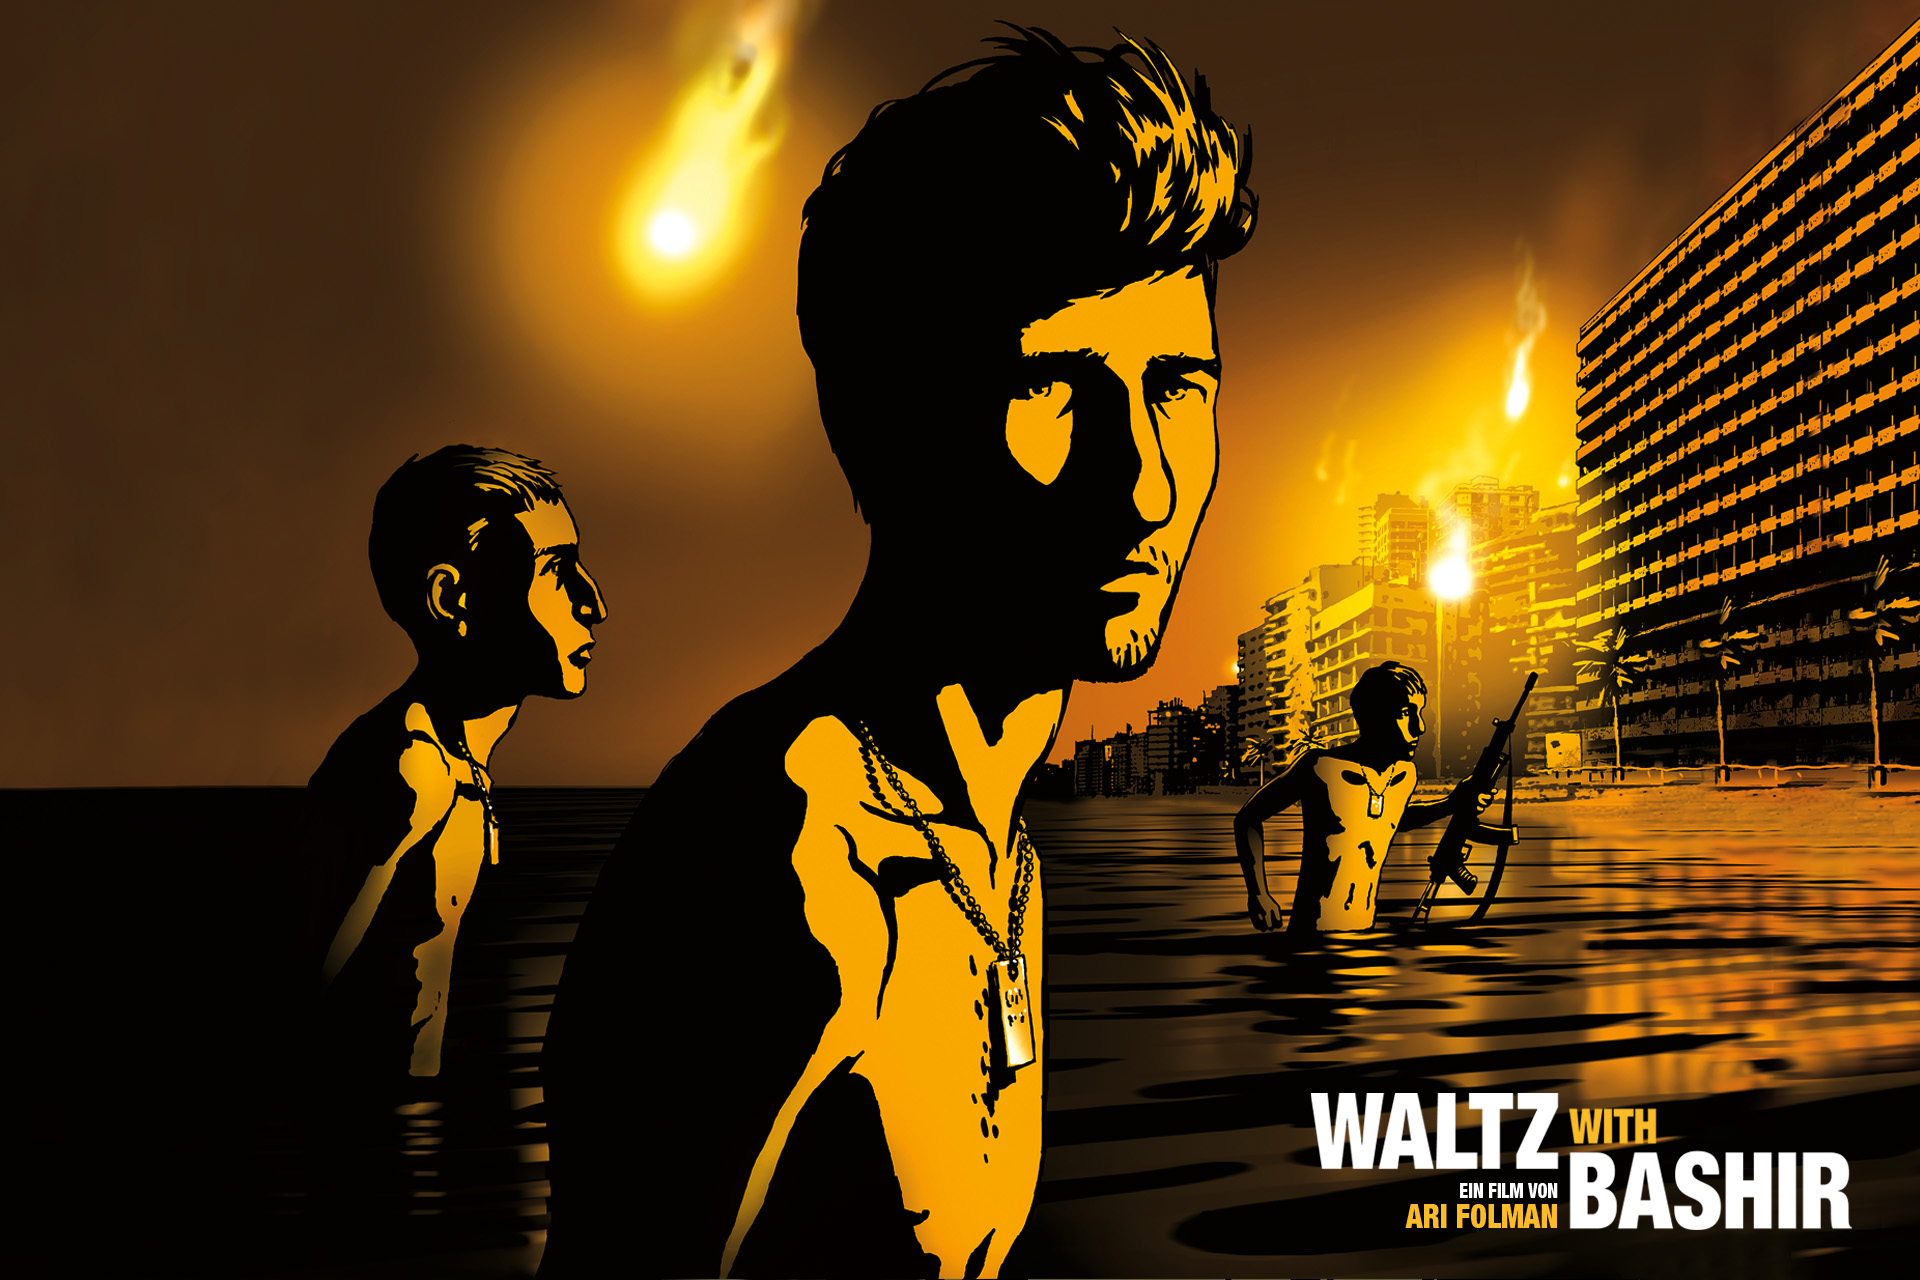 waltzwithbashir-banner.jpg